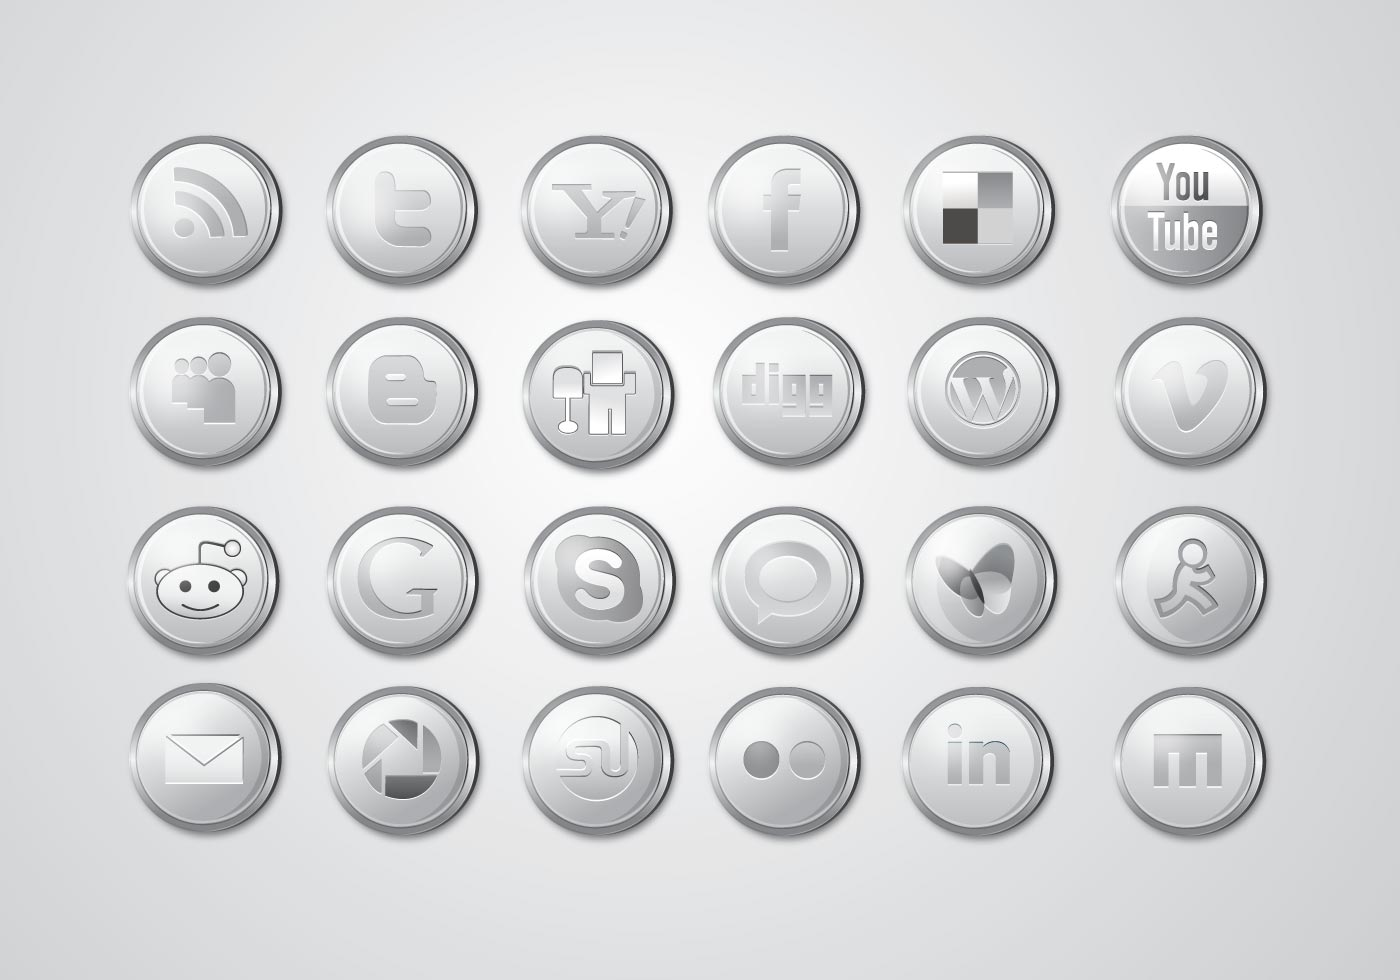 Social media clipart packs jpg library Free Social Media Icons - Download SVG, EPS & PNG jpg library